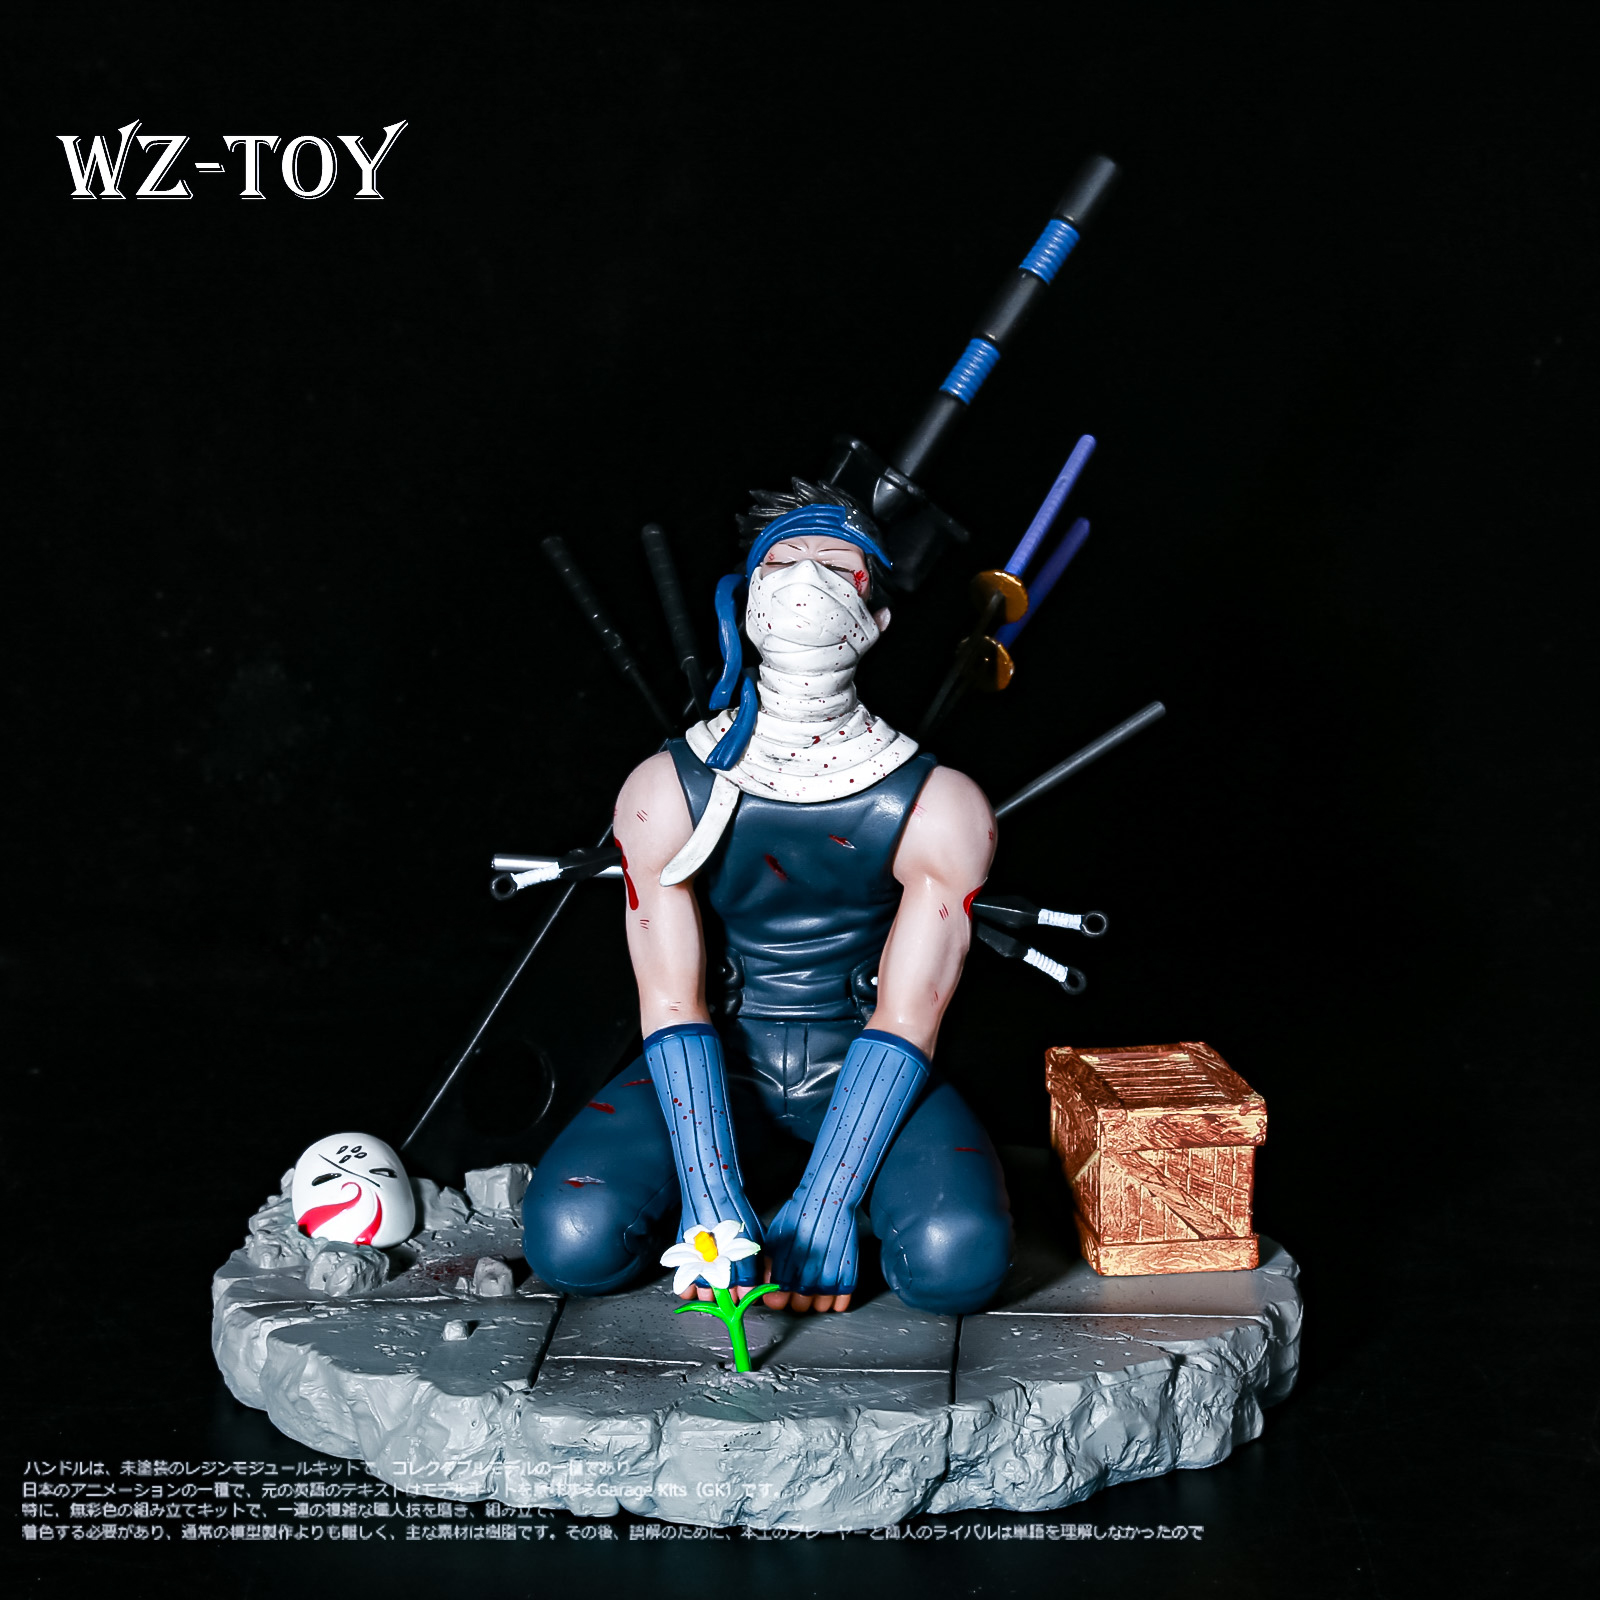 火影忍者手?桃地再不?GK HMB?隠鬼人模型?布玩具彫像プレゼント